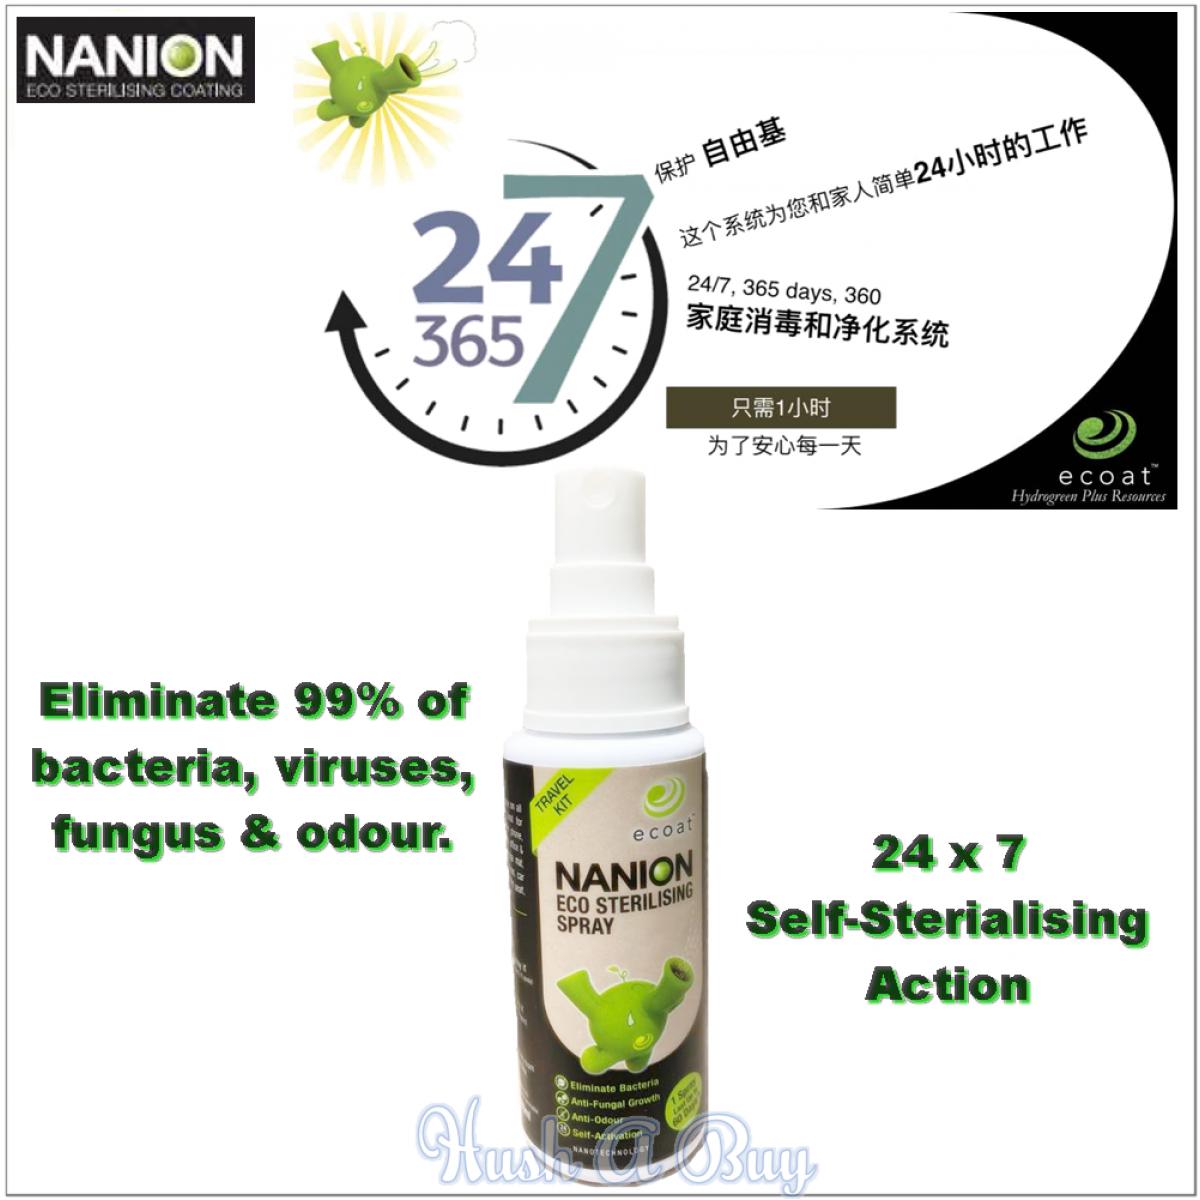 Nanion Eco Sterilising Spray 60ml - Kills 99% of Bacteria& Viruss